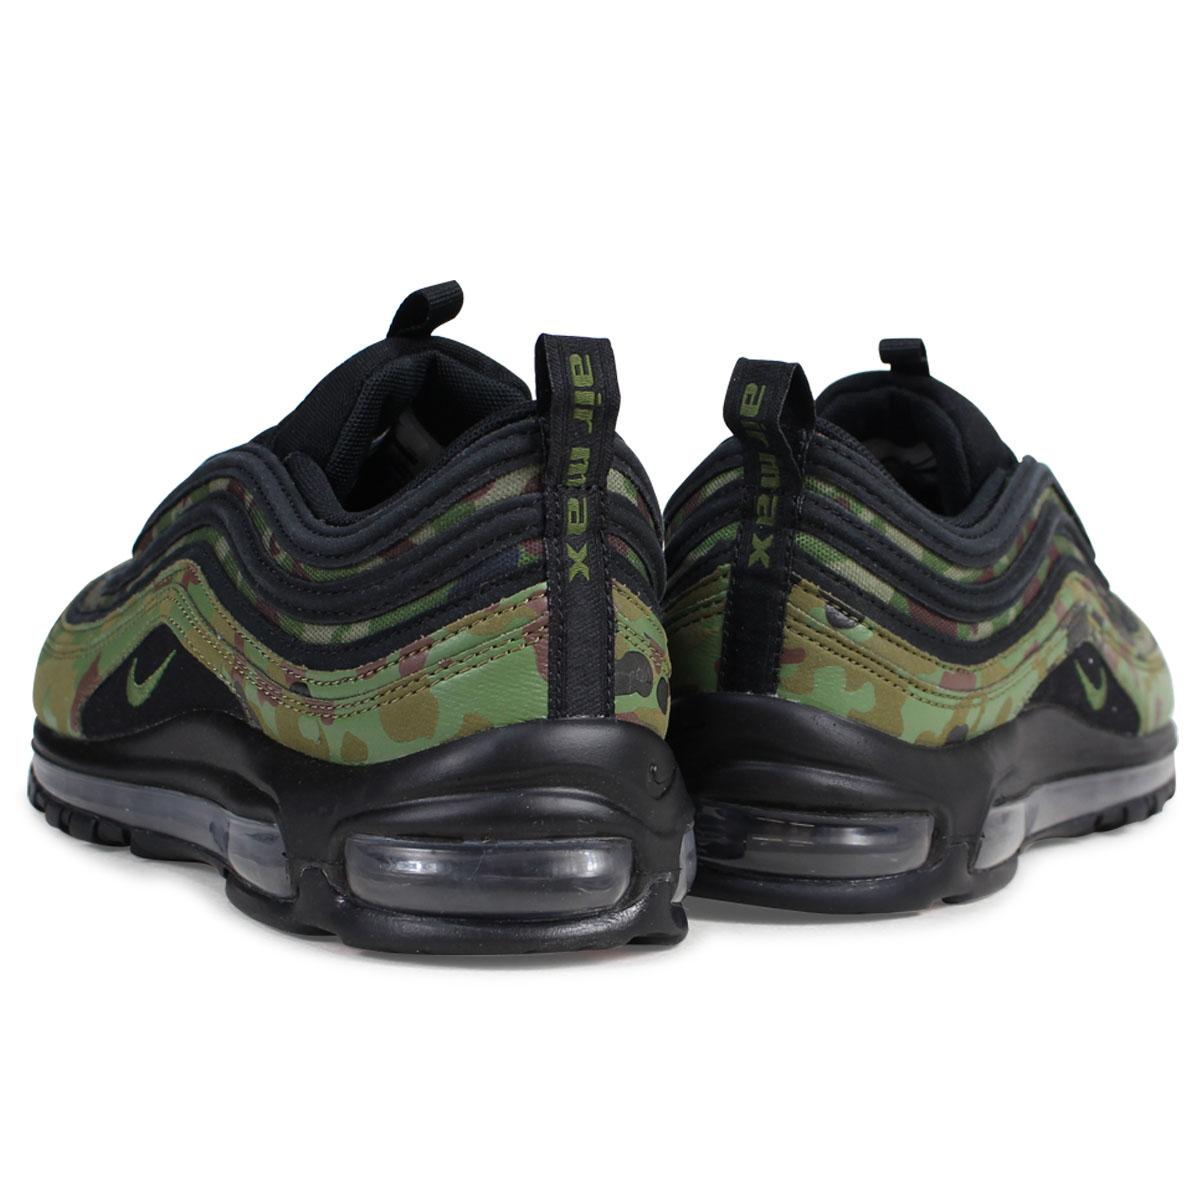 Nike AIR MAX 97 'Country CAMO Japan' AJ2614 203: